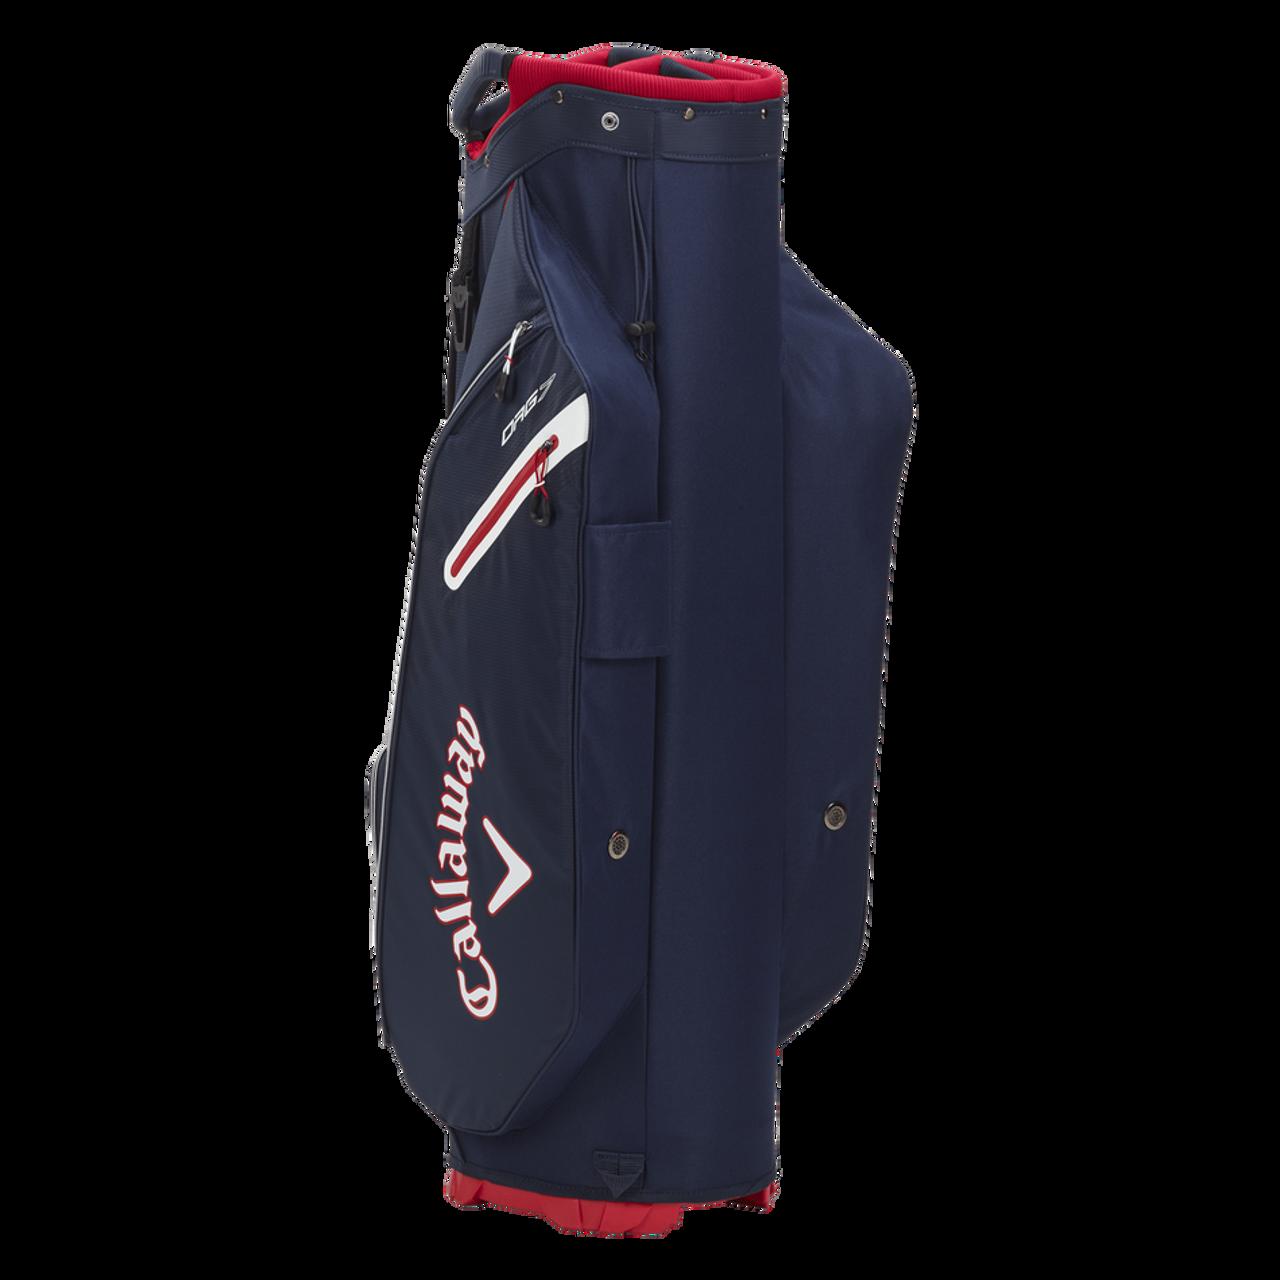 Callaway Org 7 Cart Bag 2021 - Navy / Red / White